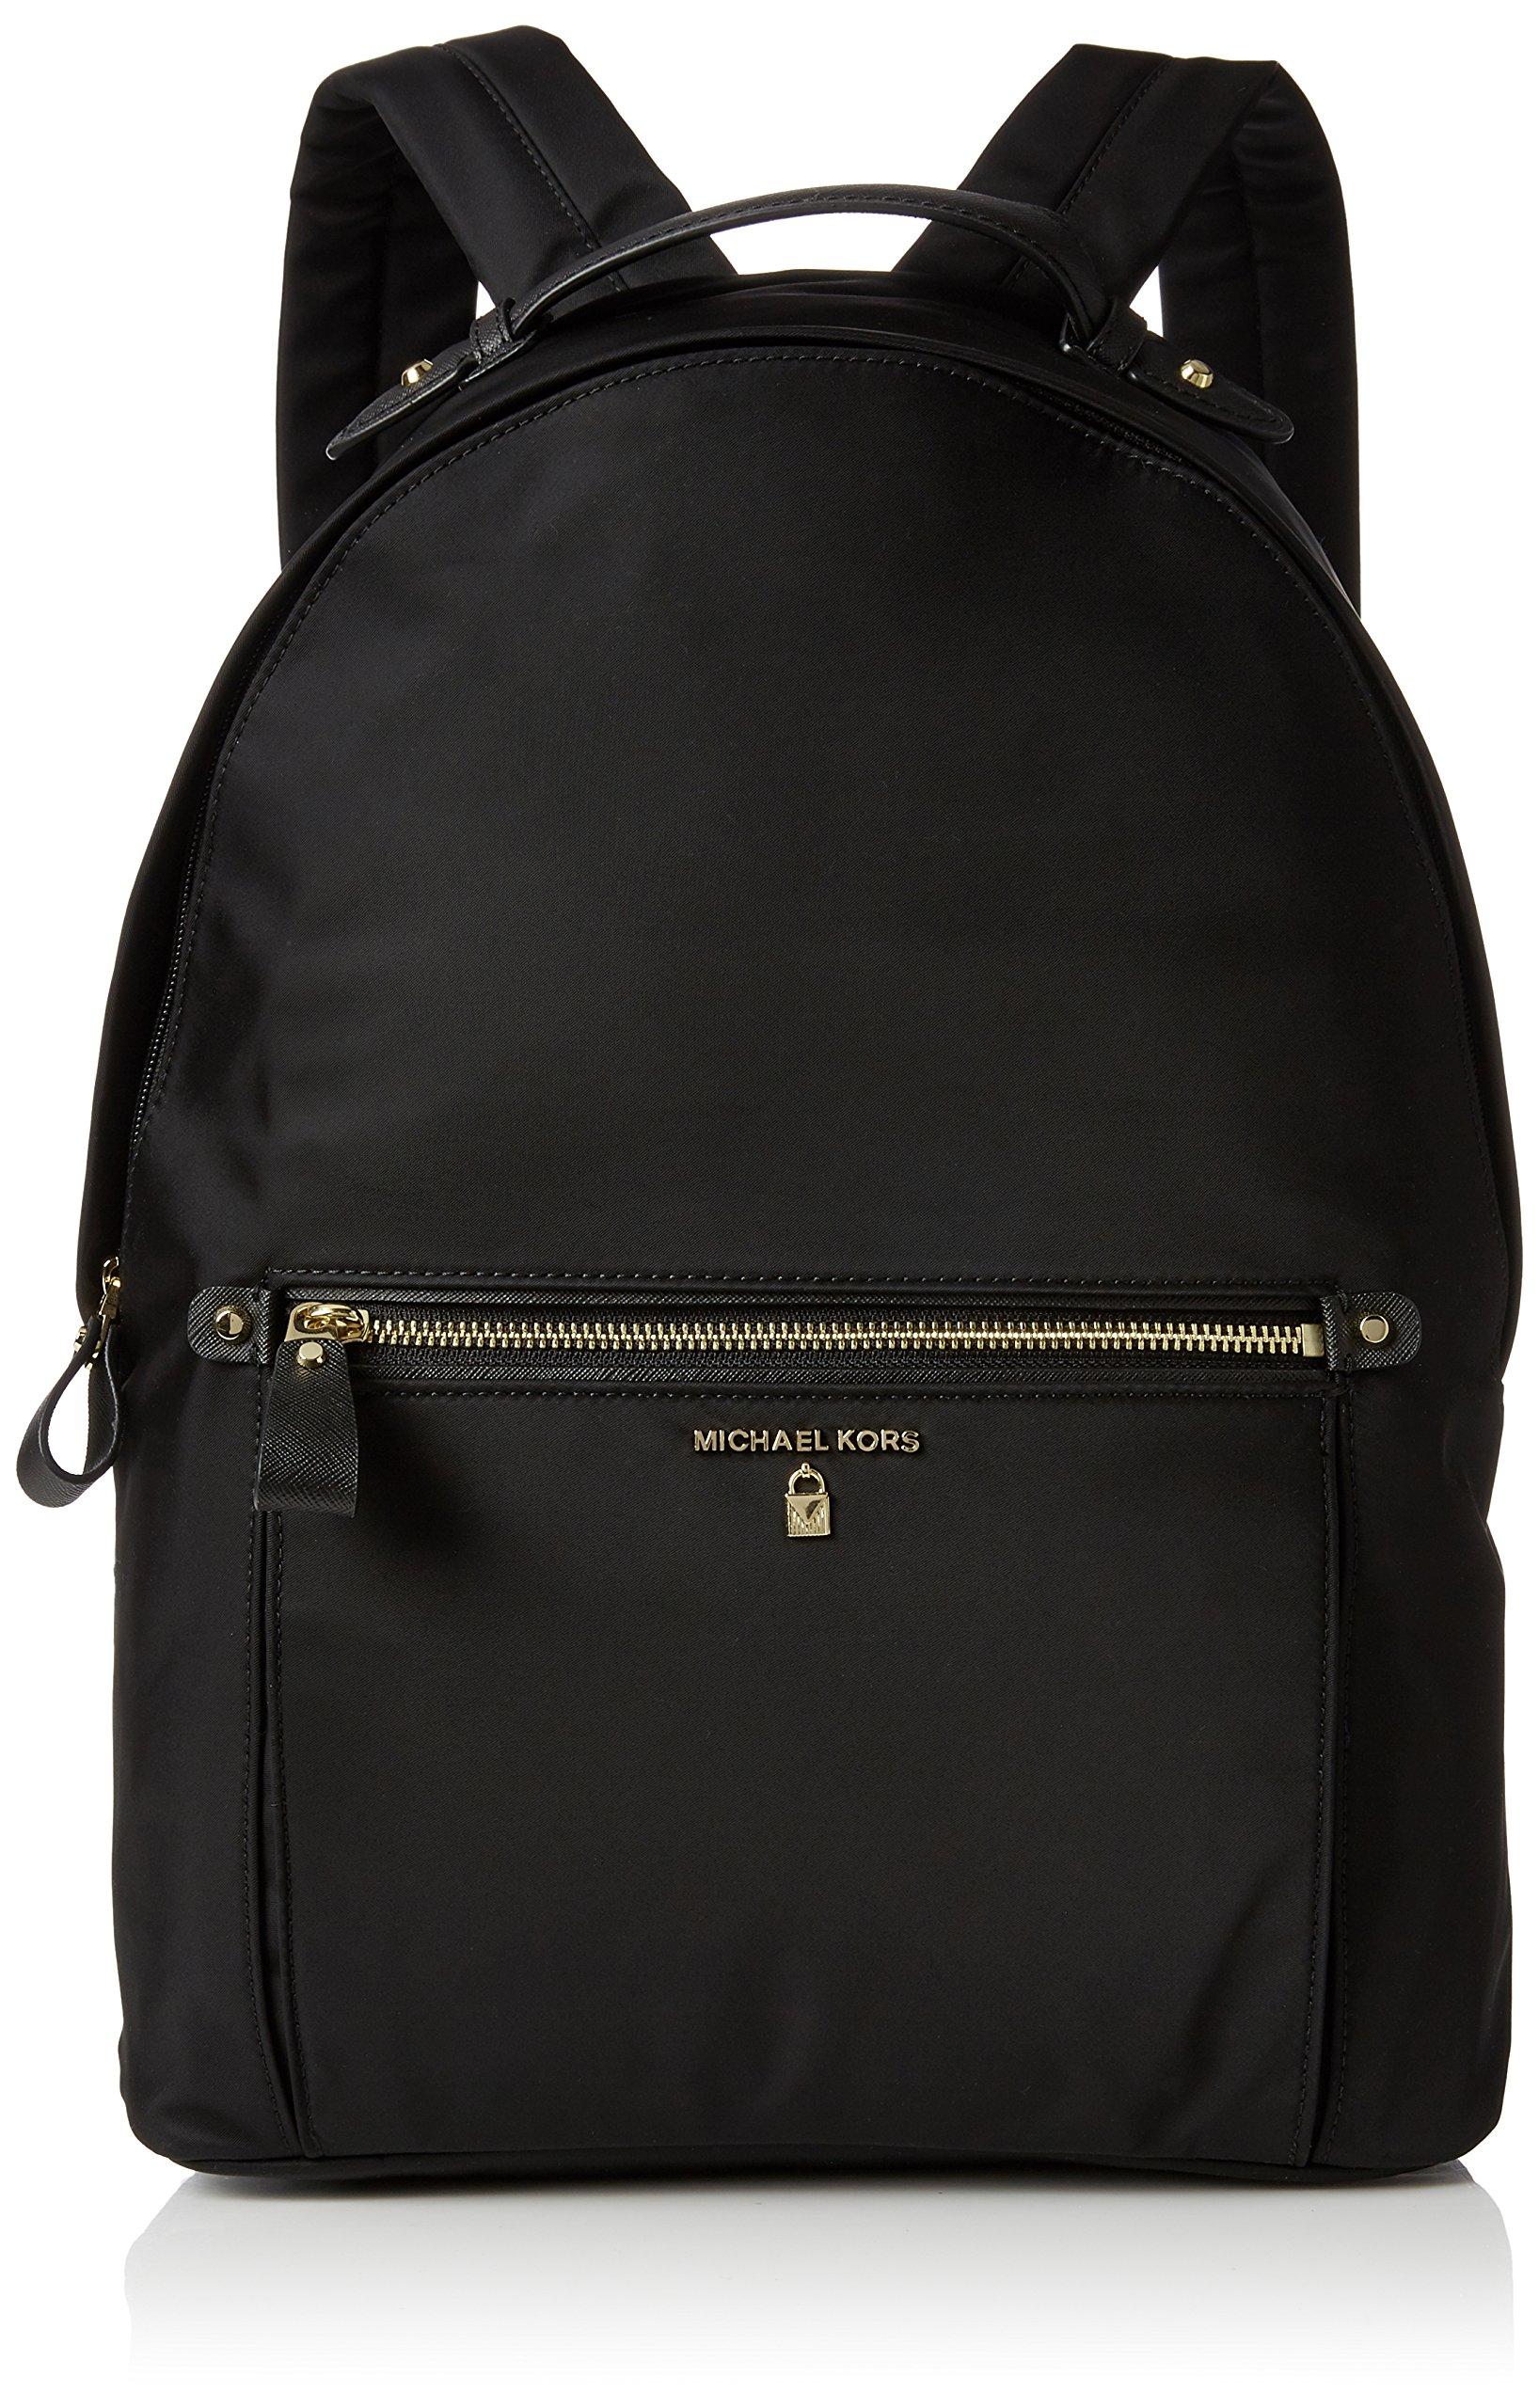 Michael Kors Kelsey Backpack Handbag